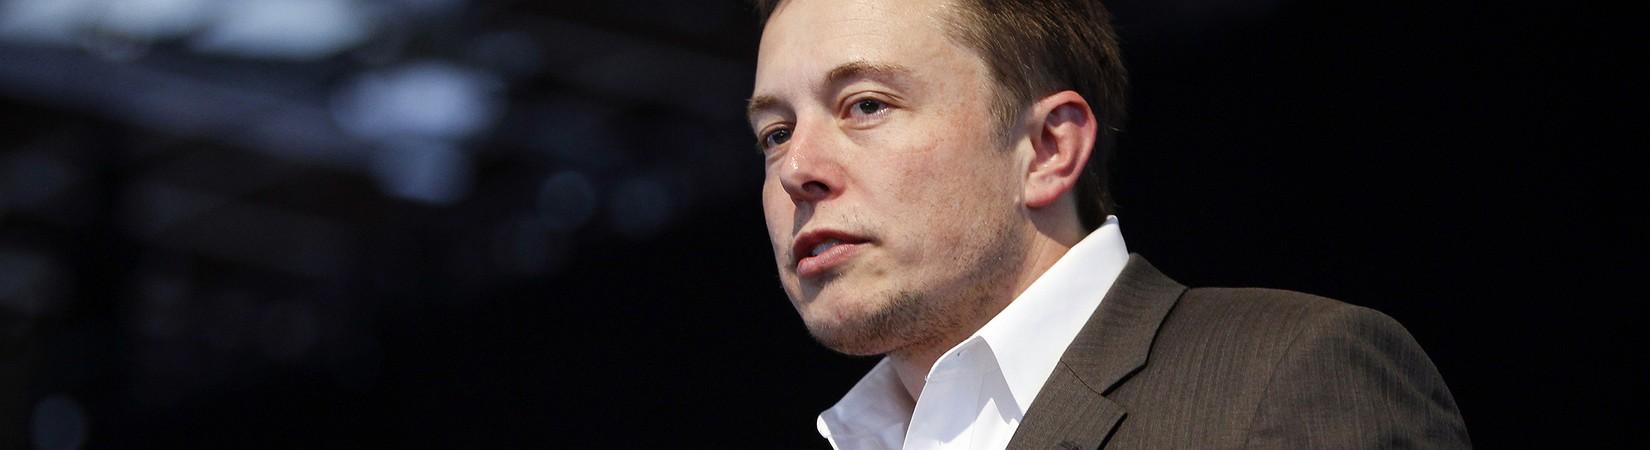 Elon Musk contra los trolls de Internet